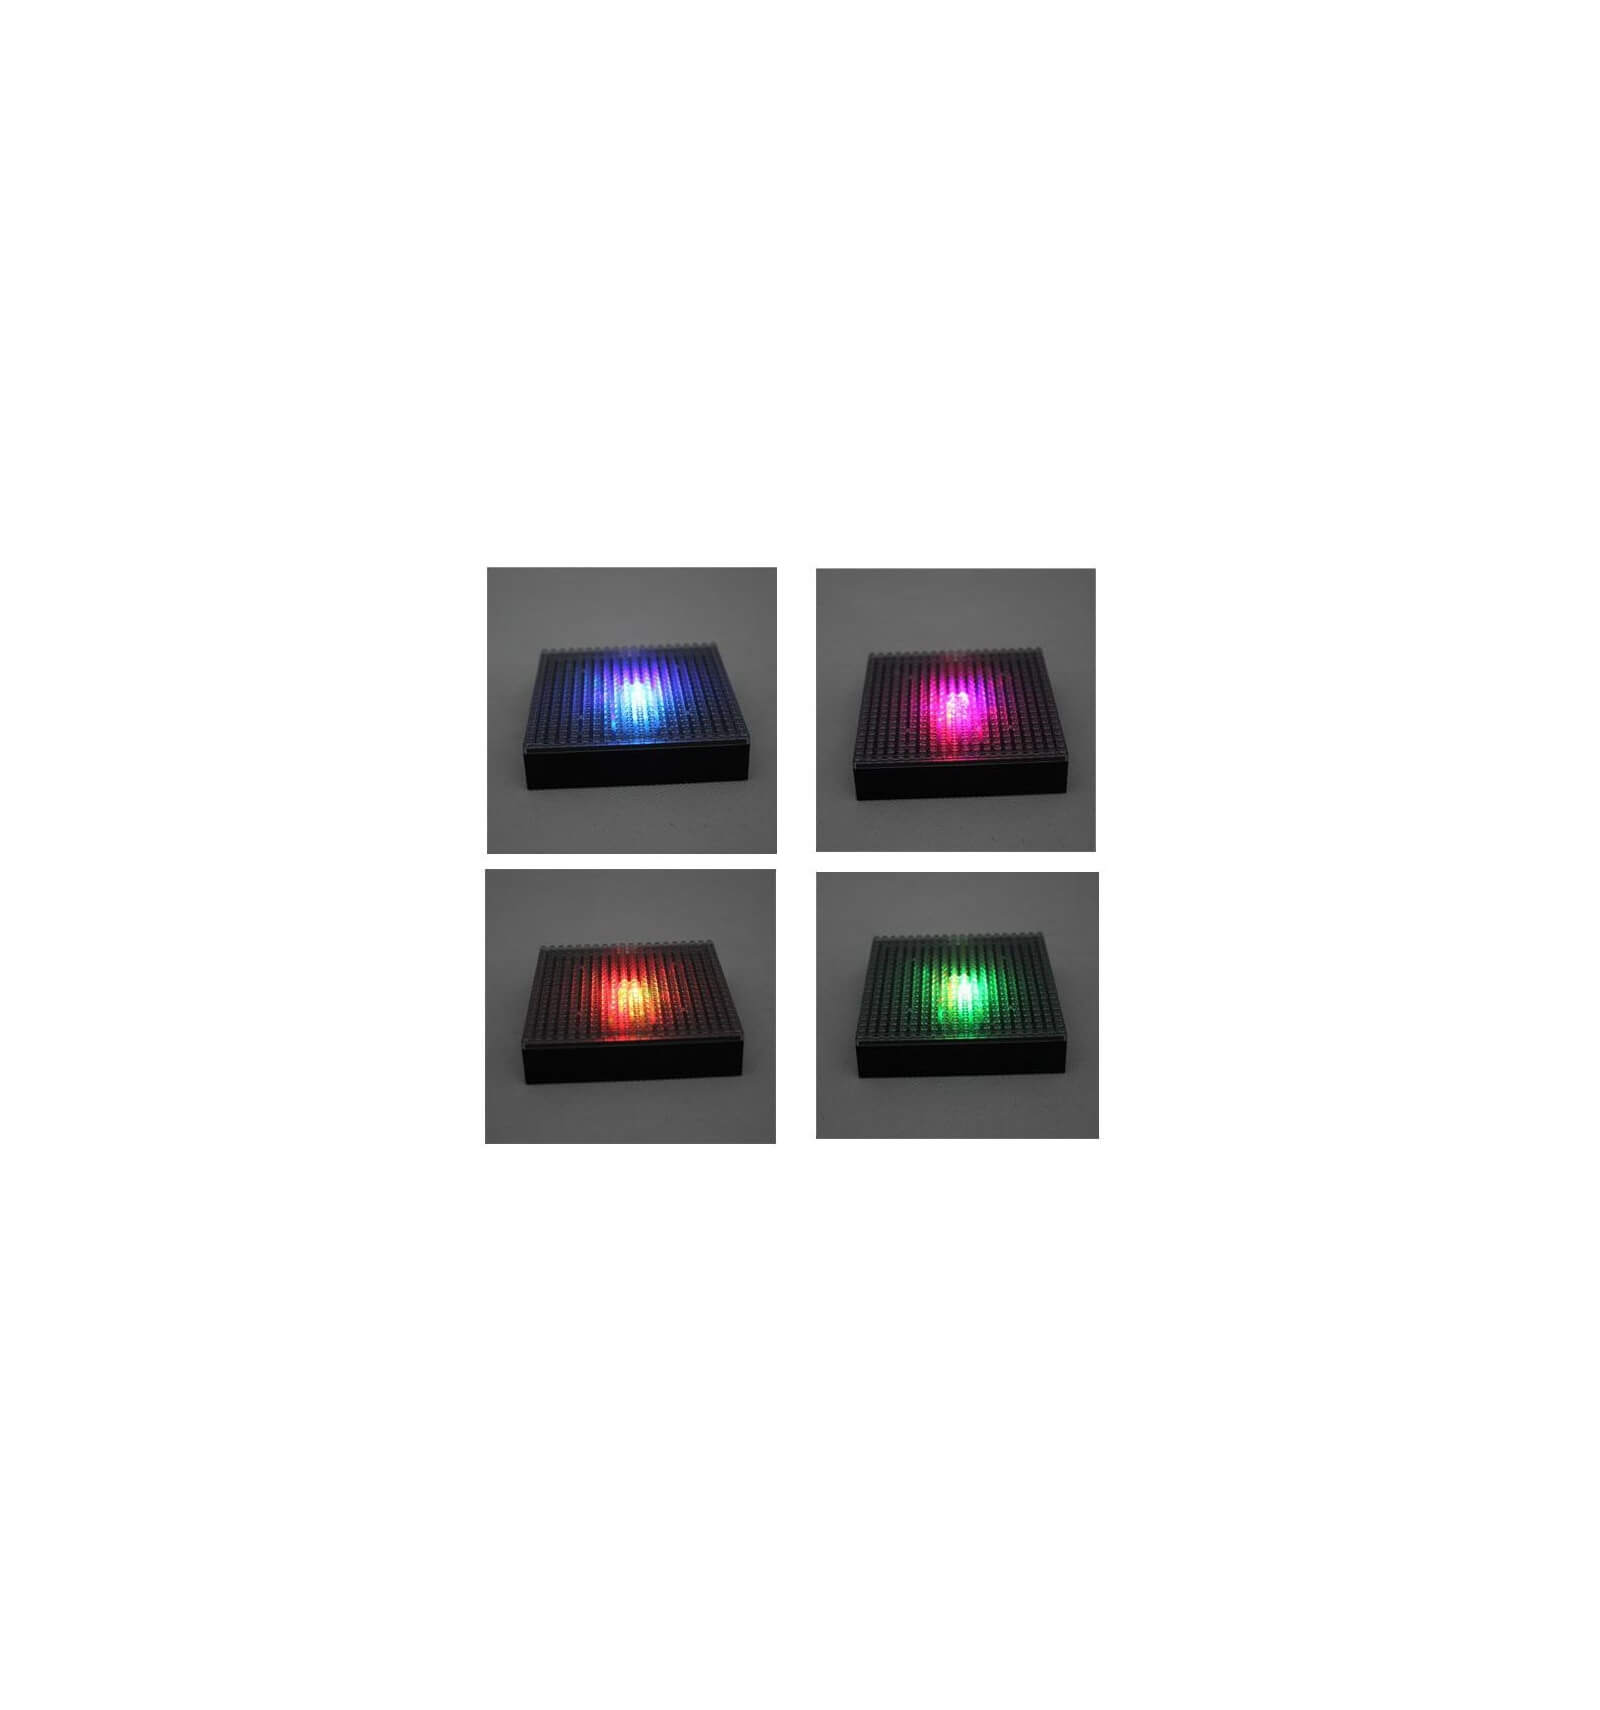 Iluminar Con Leds. Interesting Iluminacin Led Cocinas Iluminar ...